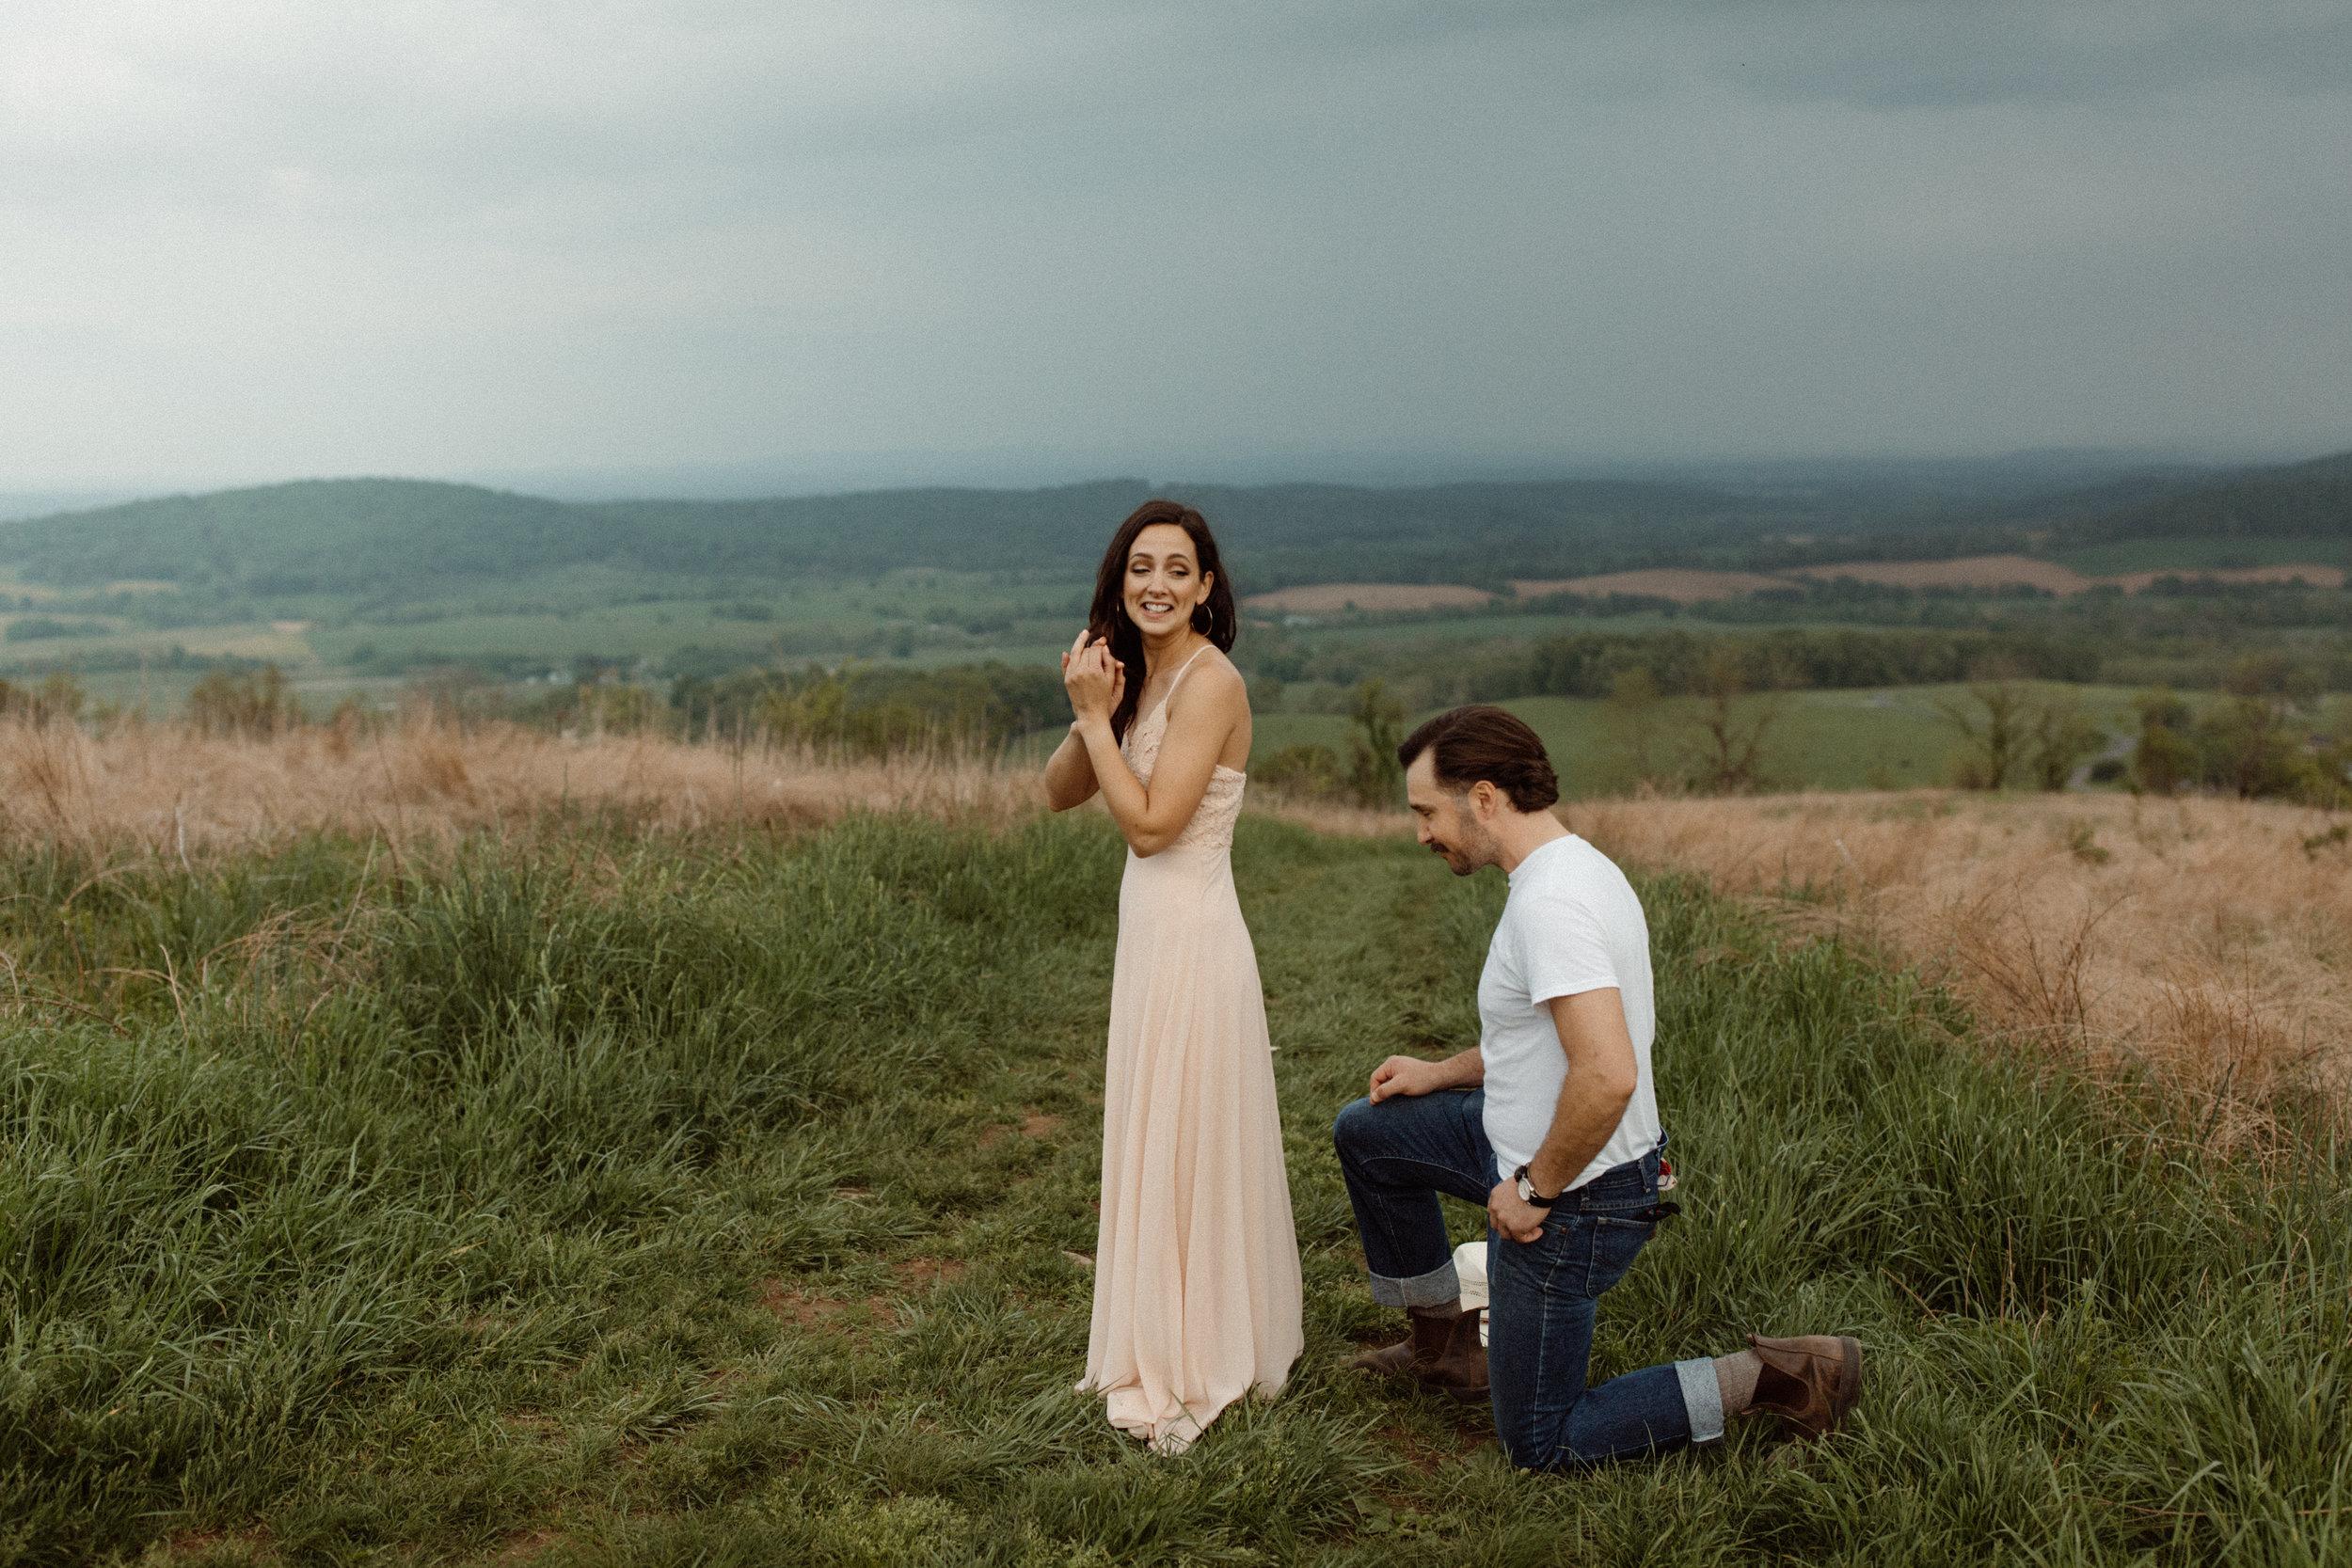 kelsey&mark-engagement-skymeadows-2019-peytoncurry-9770.jpg